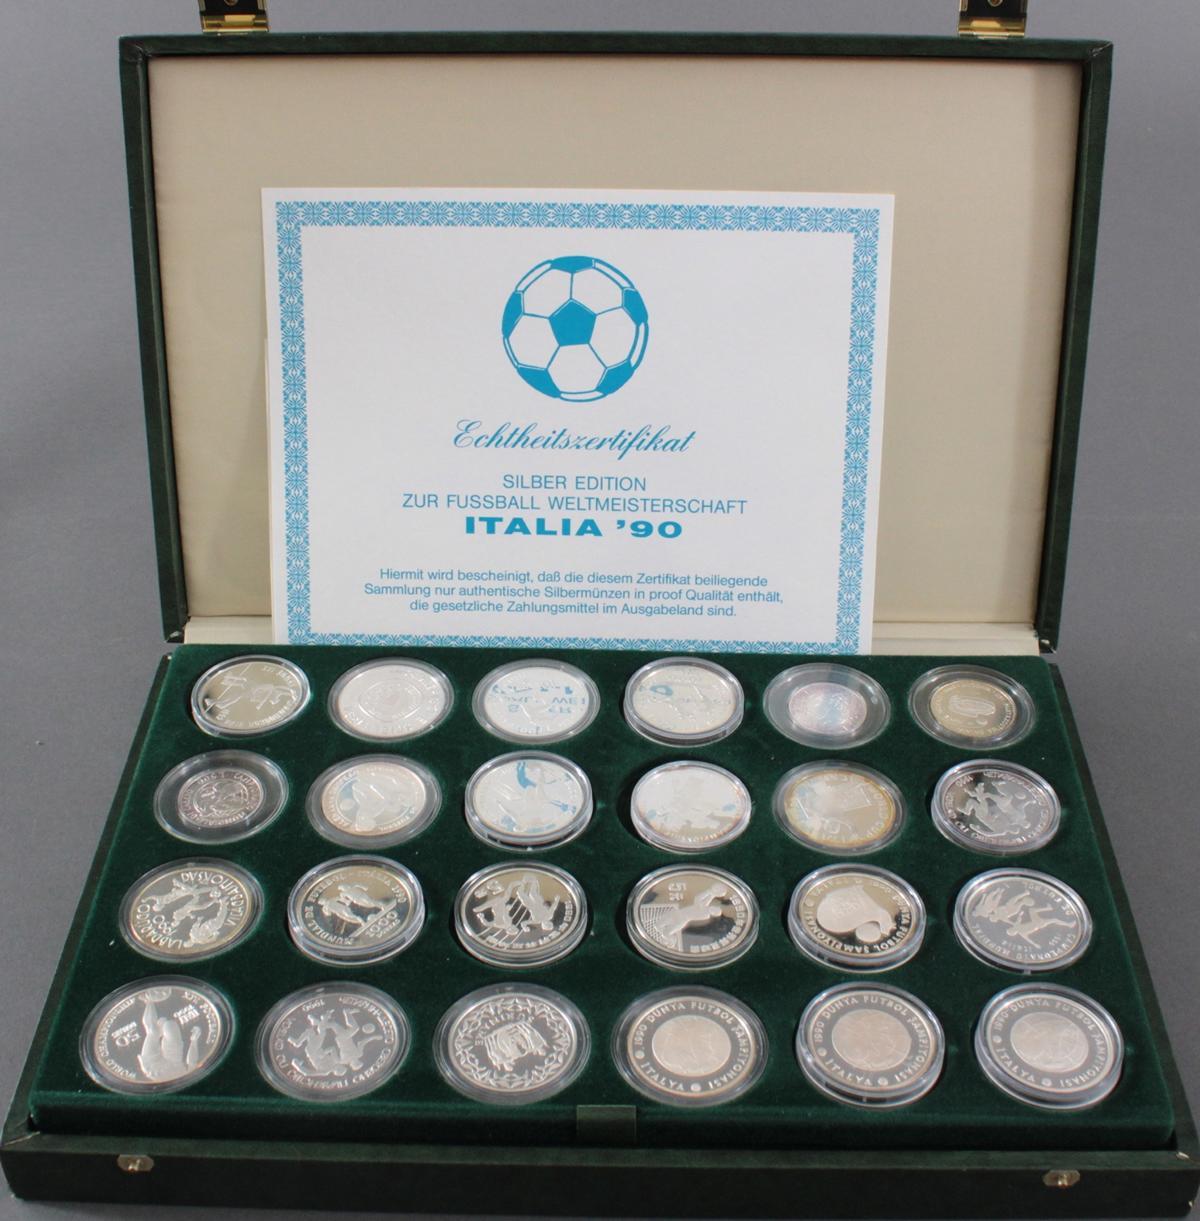 Italien – Silberedition zur Fussball-Weltmeisterschaft 1990-4